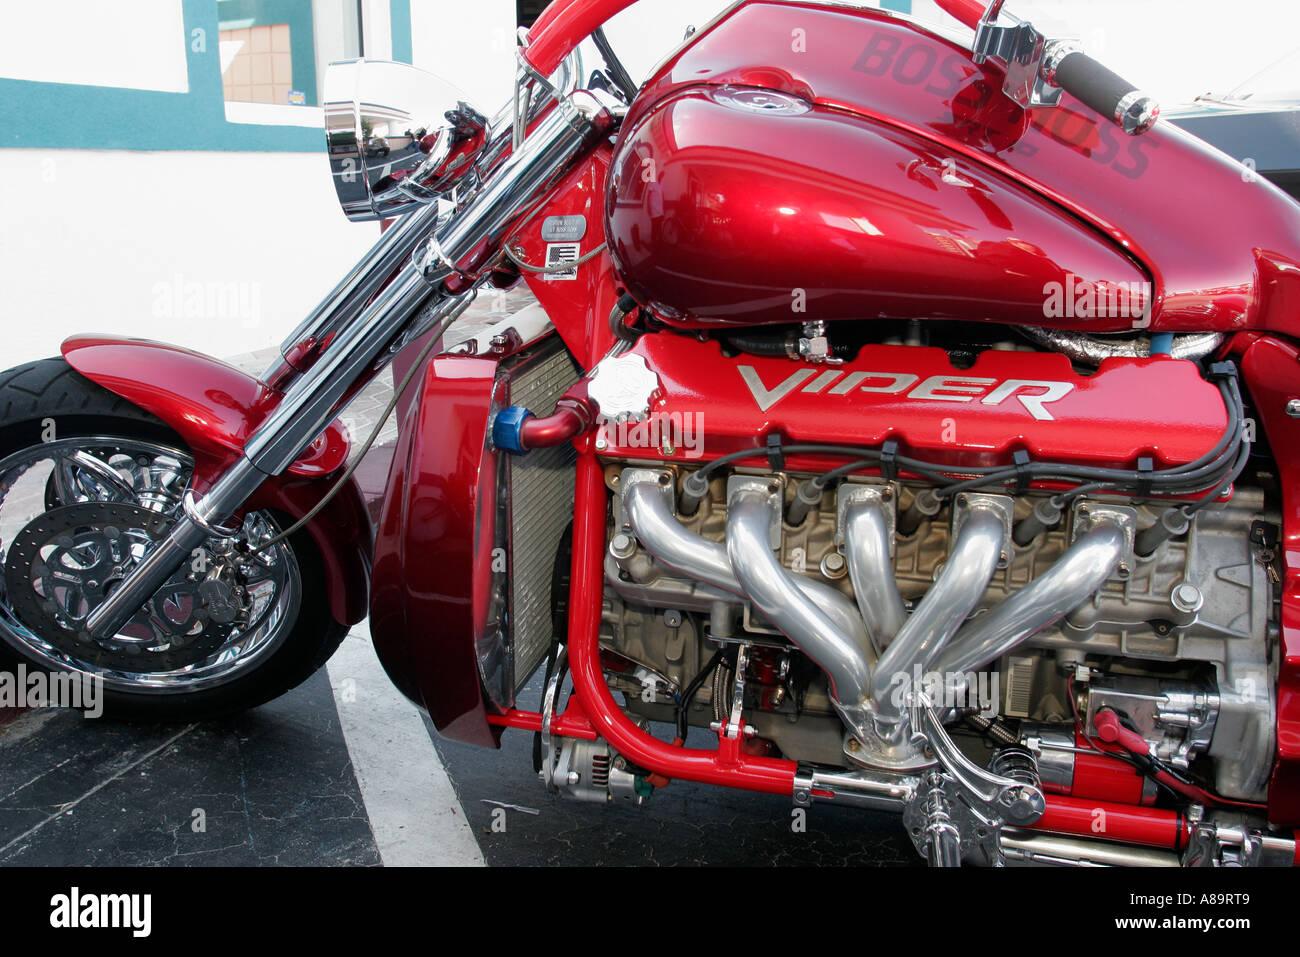 South County Dodge >> Daytona Beach Florida A1A Bike Week Boss Hoss Dodge Viper V 10 engine Stock Photo: 6876872 - Alamy